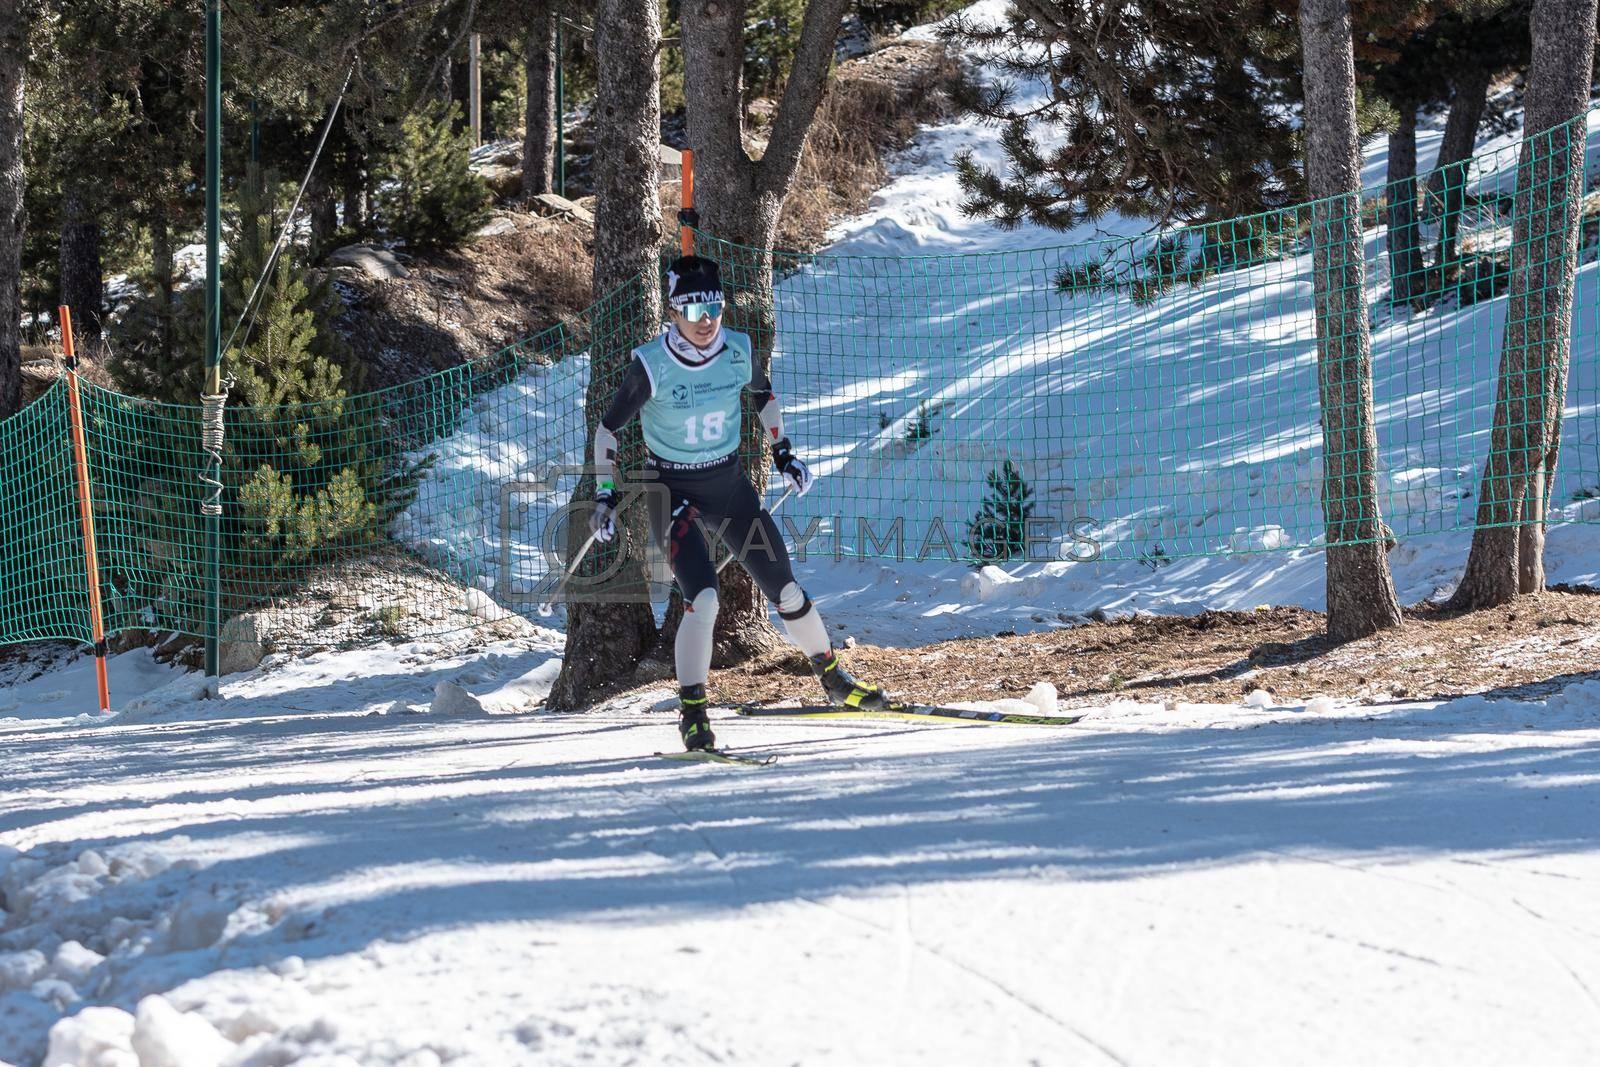 Naturlandia, Andorra : 2021 March 20 : Valeria Kuznetsova RUS in the 2021 World Triathlon Winter Championships Andorra